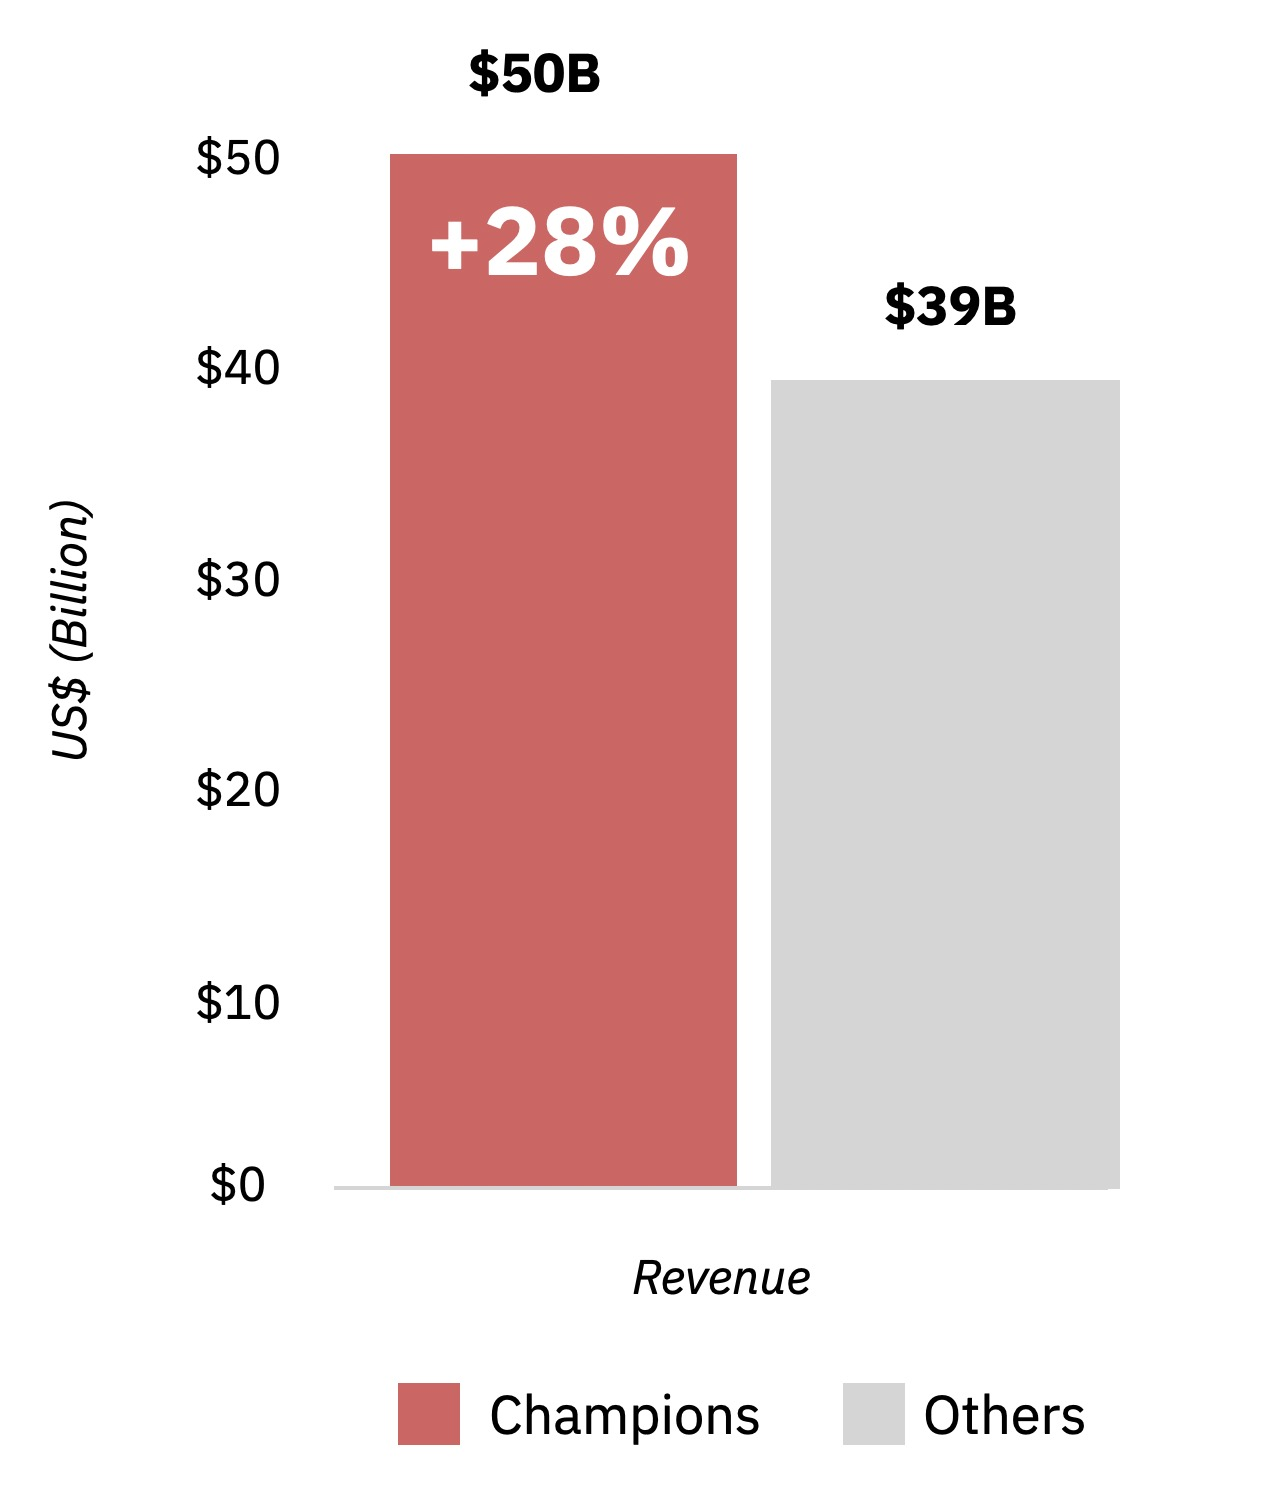 Revenue bar graph on disability inclusion champions